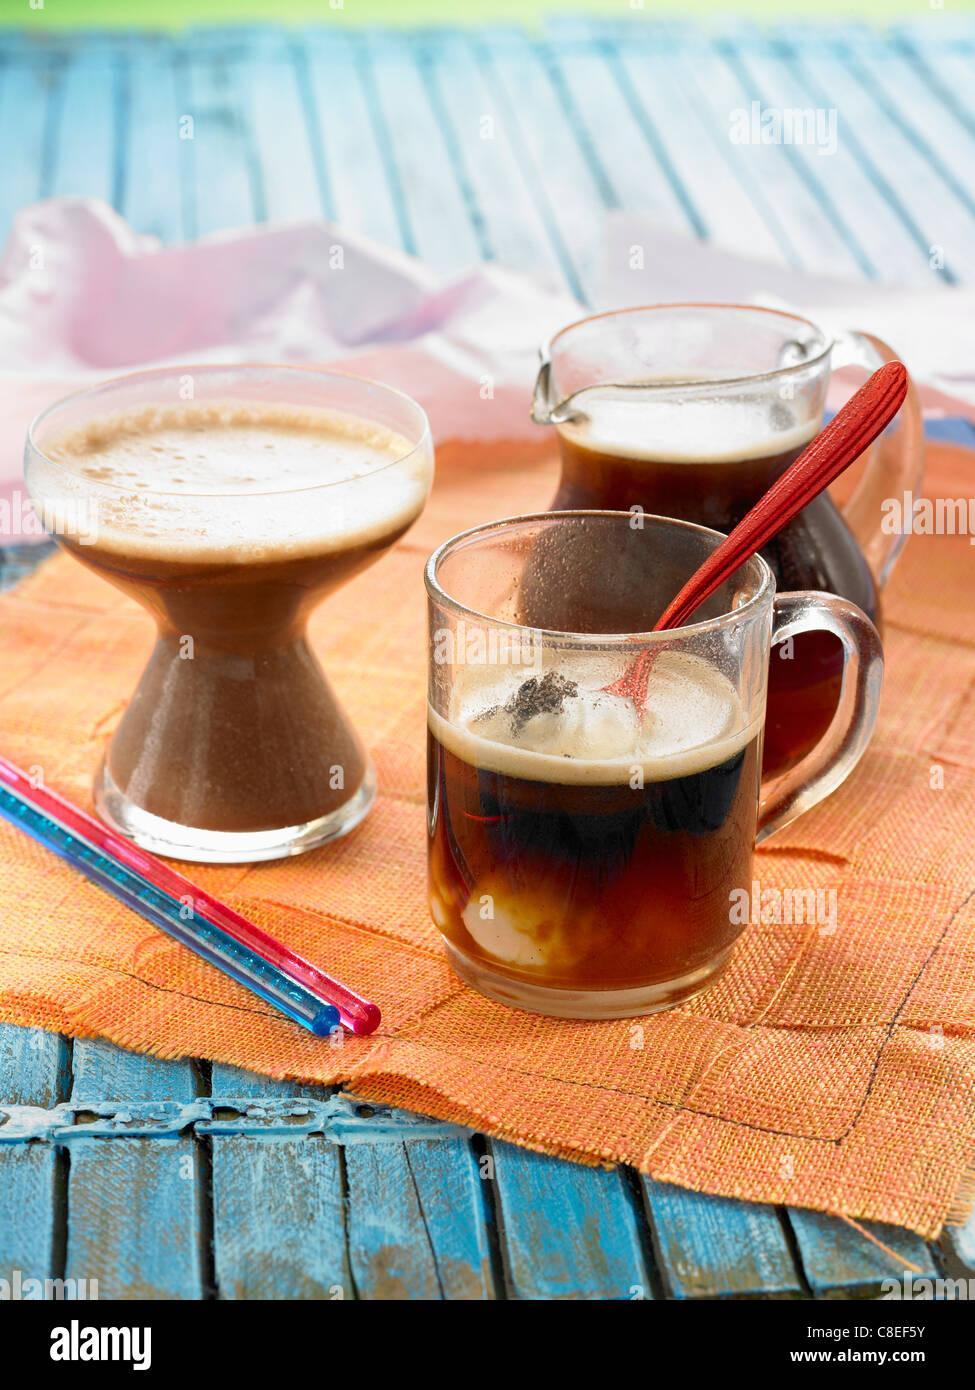 Moka Capuccino and iced coffee - Stock Image